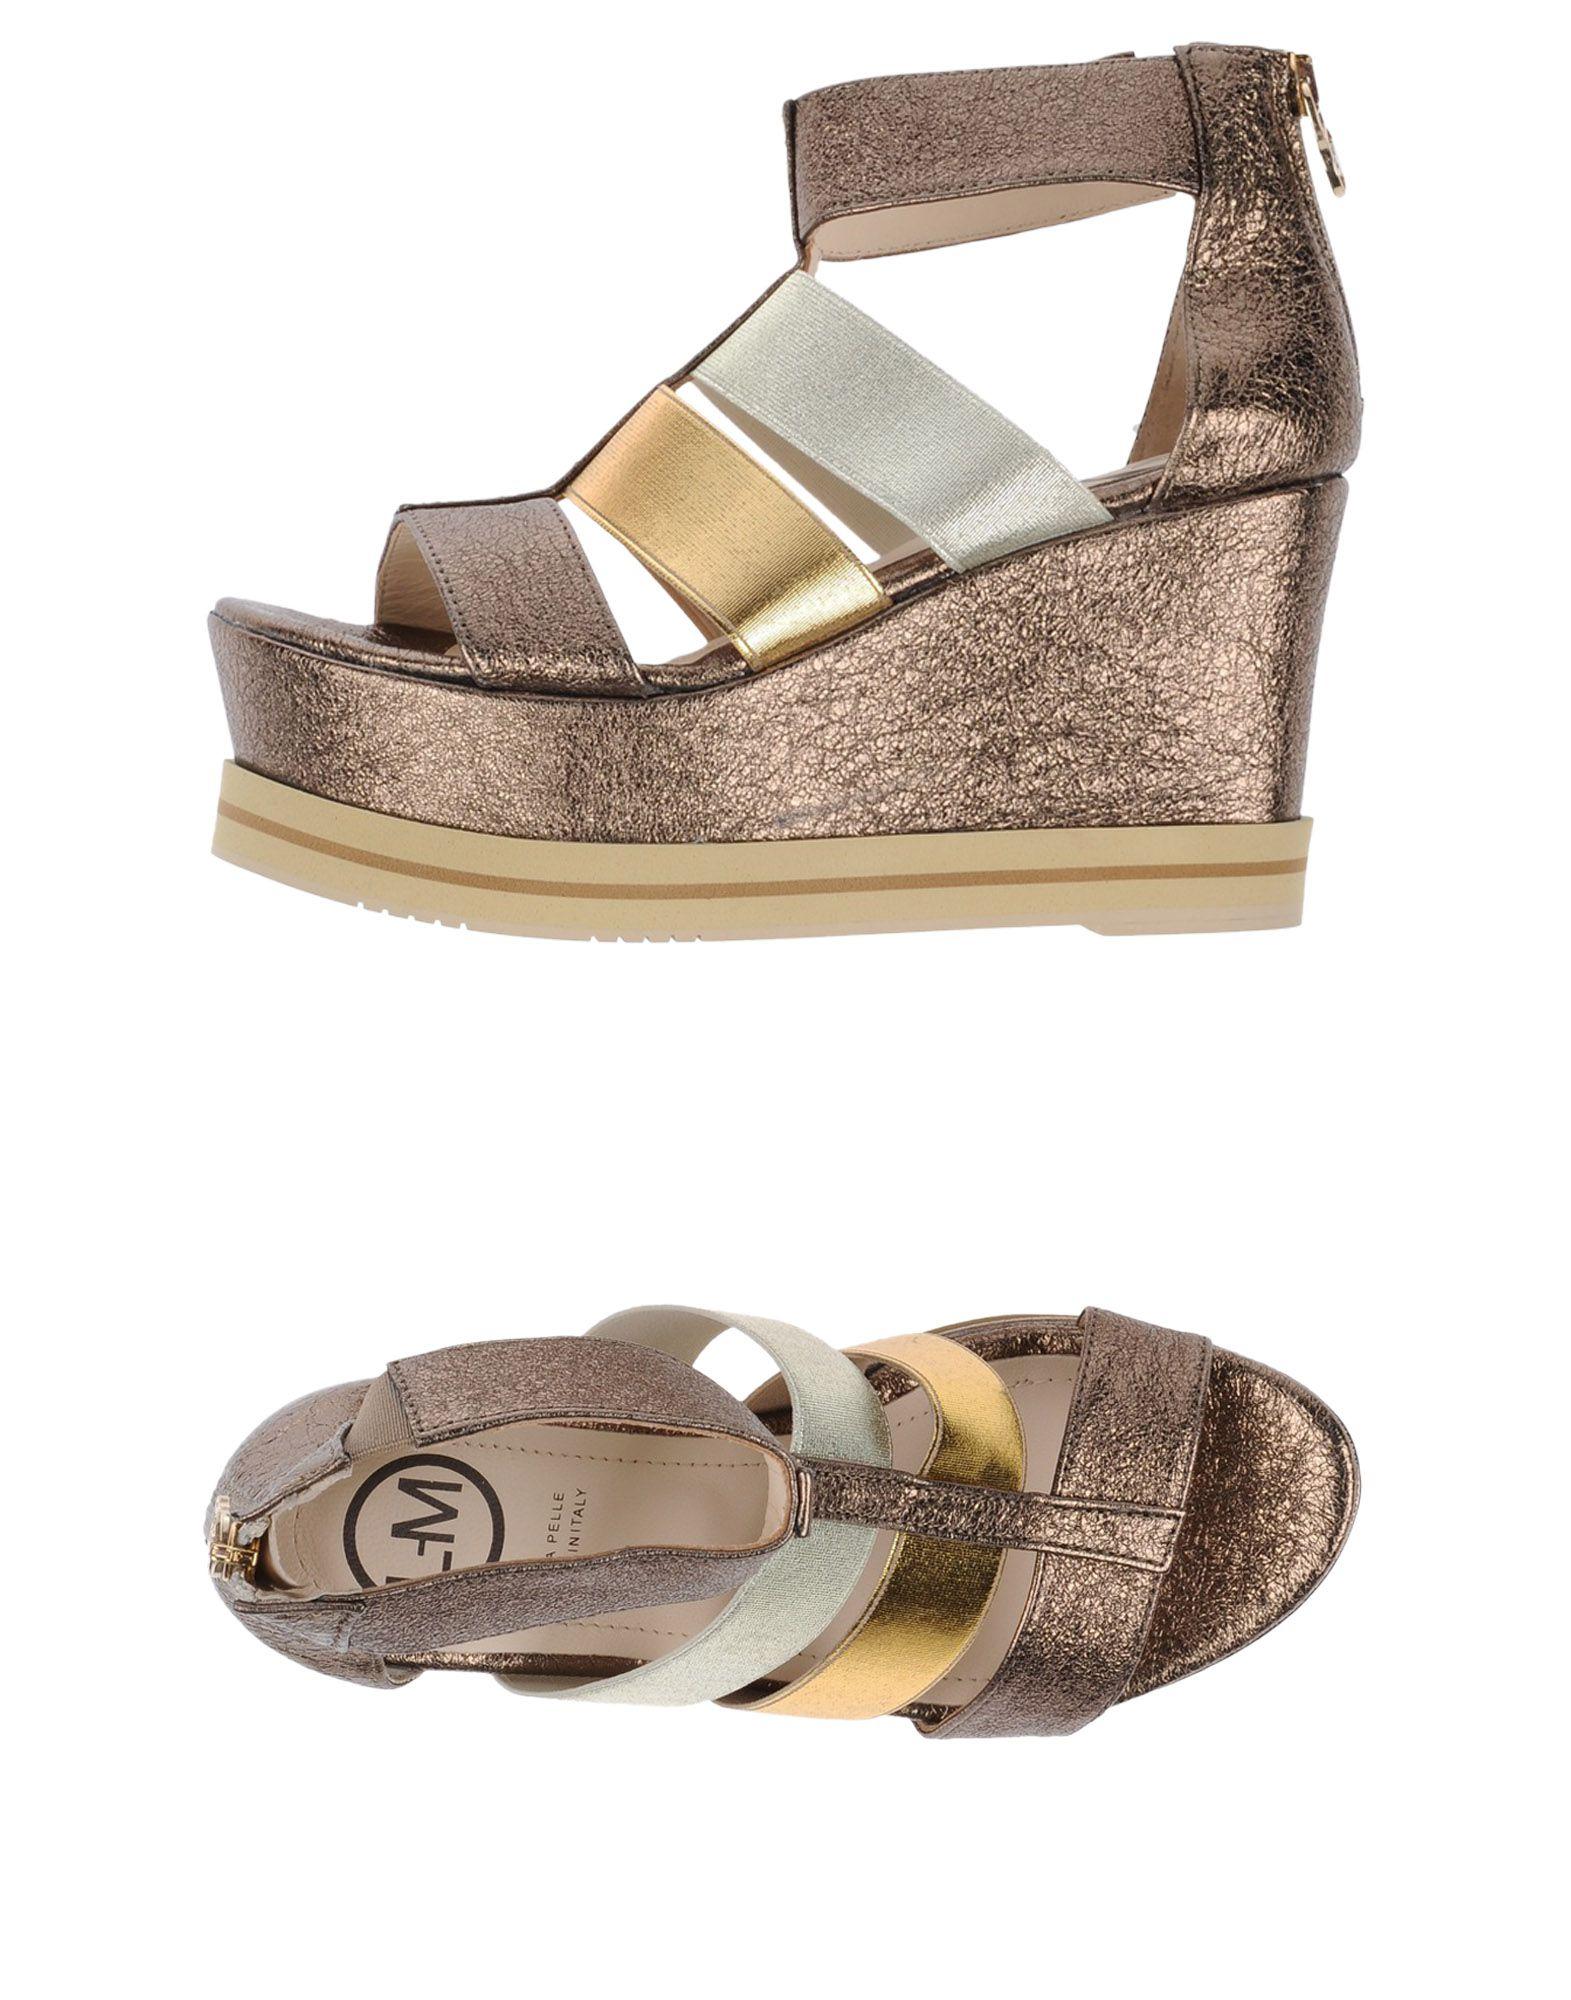 Sandales Lm Femme - Sandales Lm sur